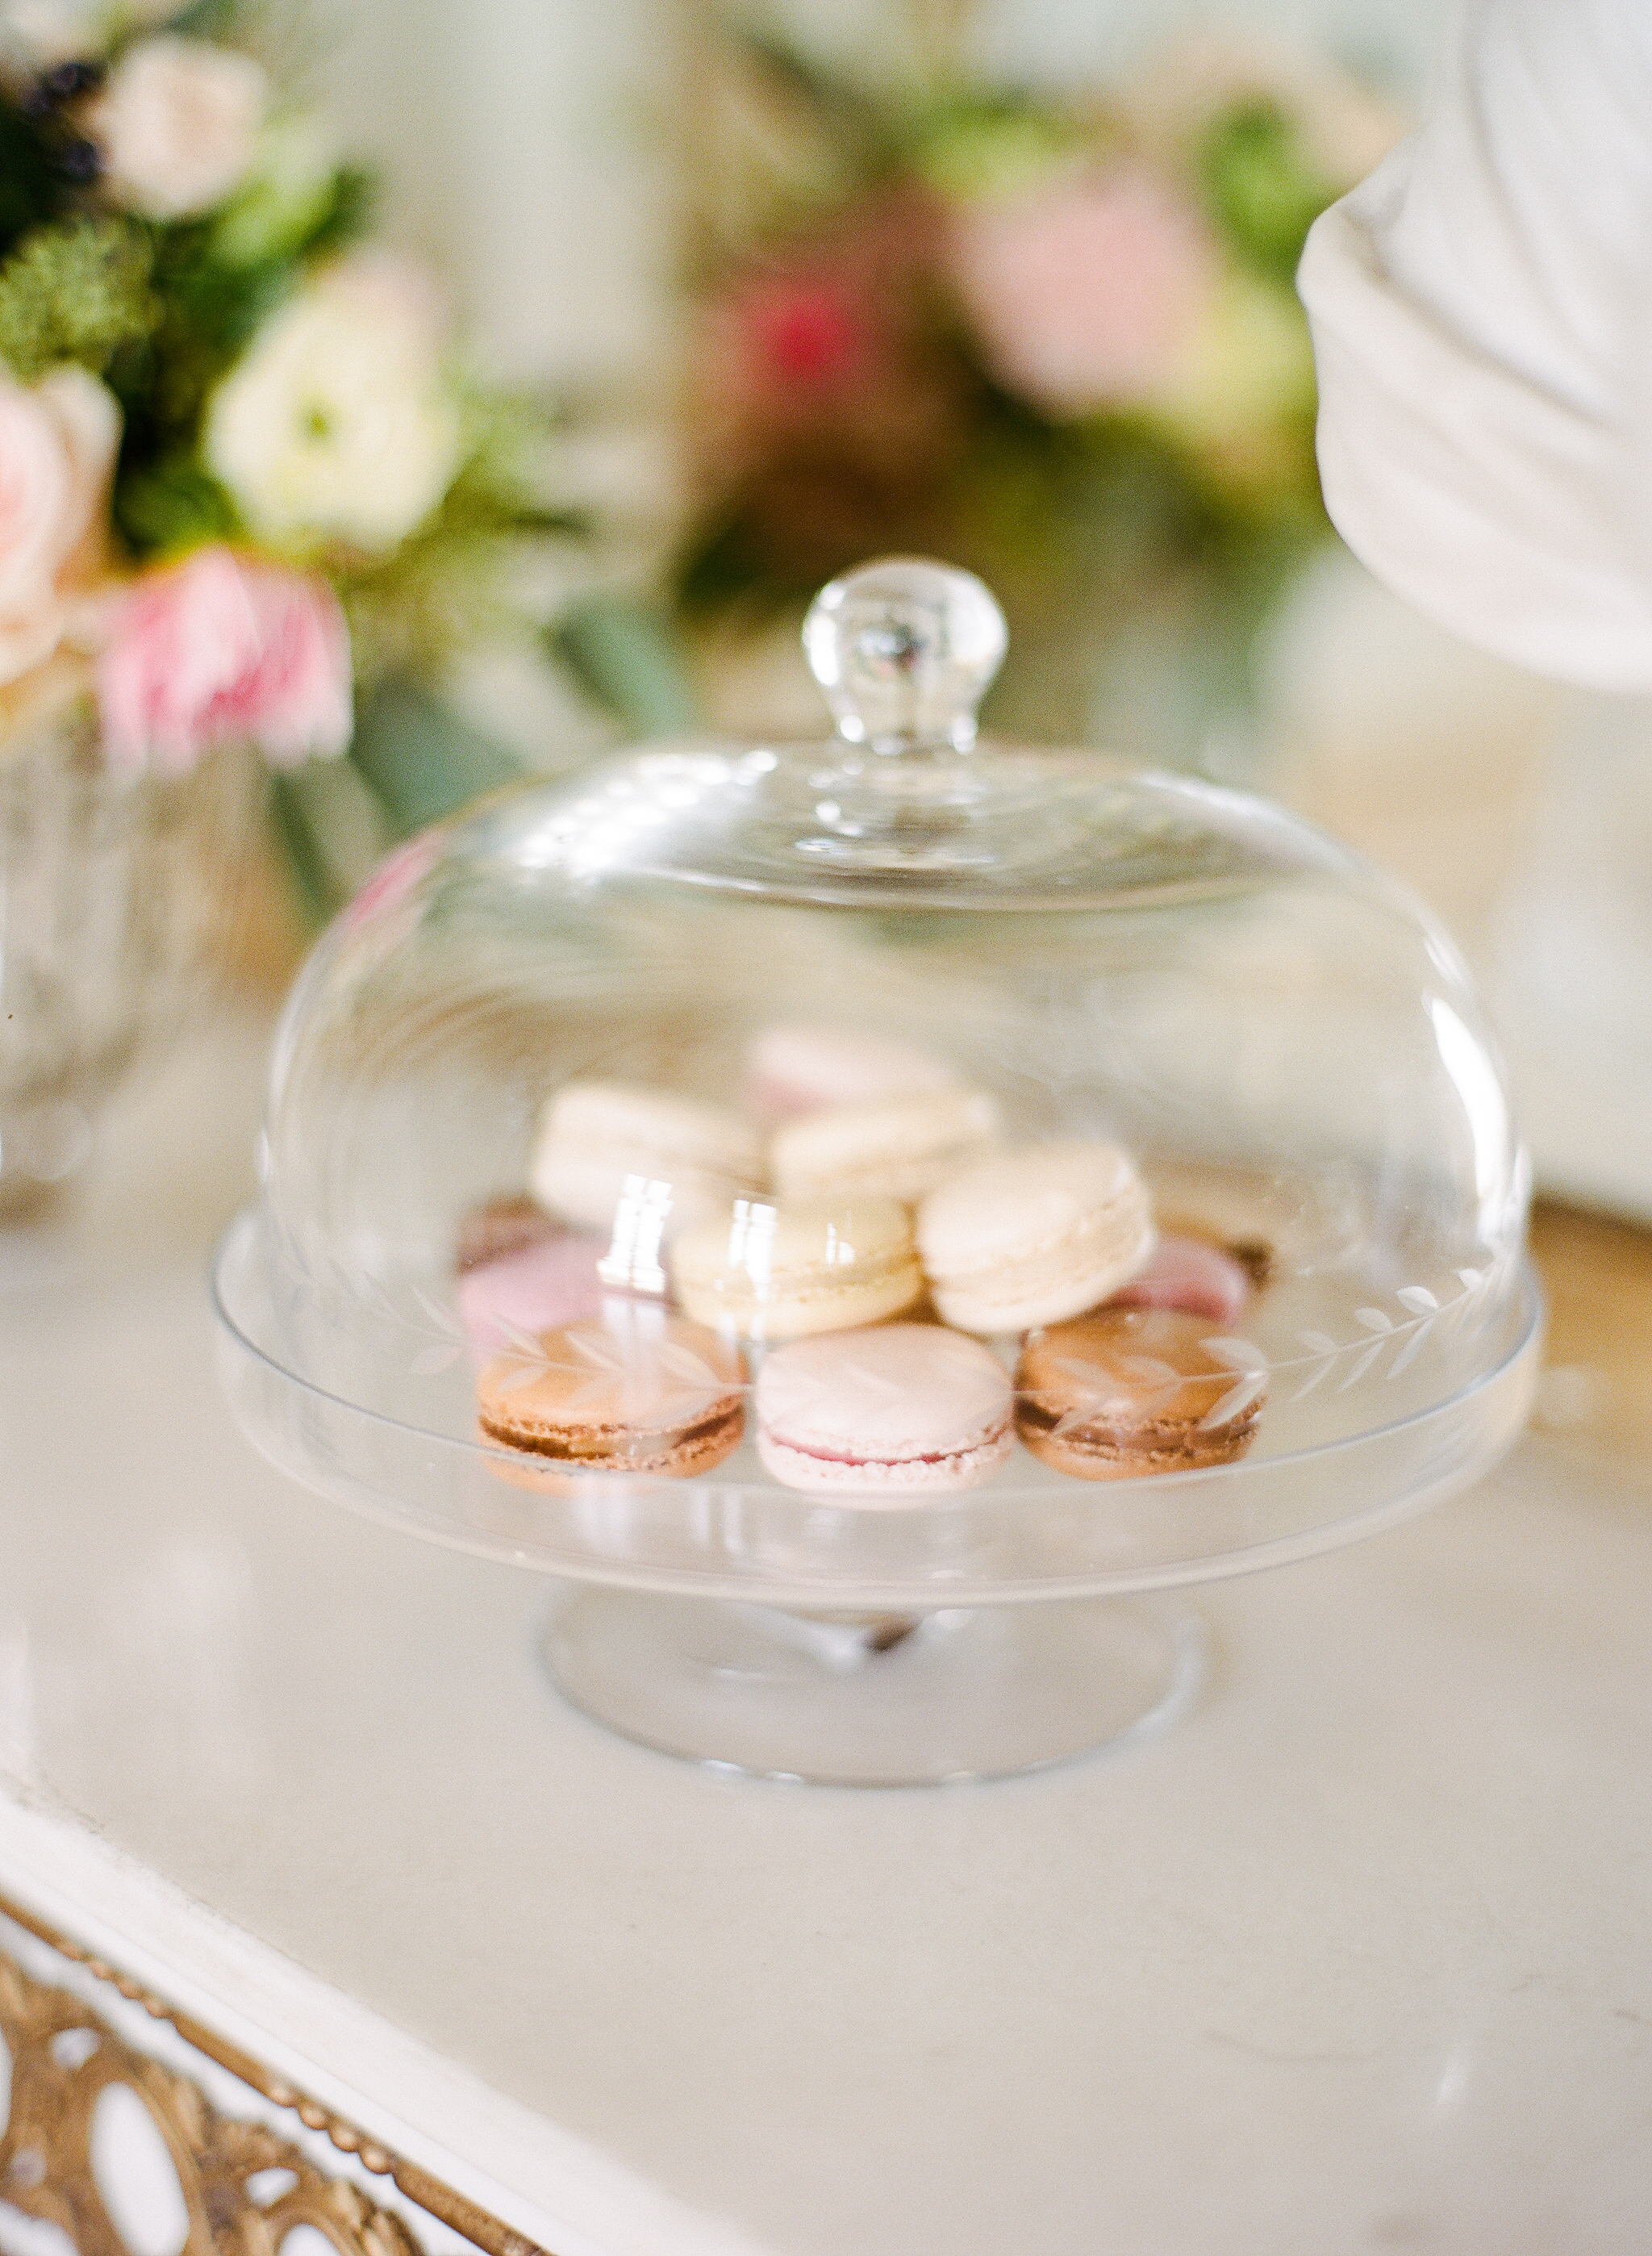 assorted macarons under a cloche